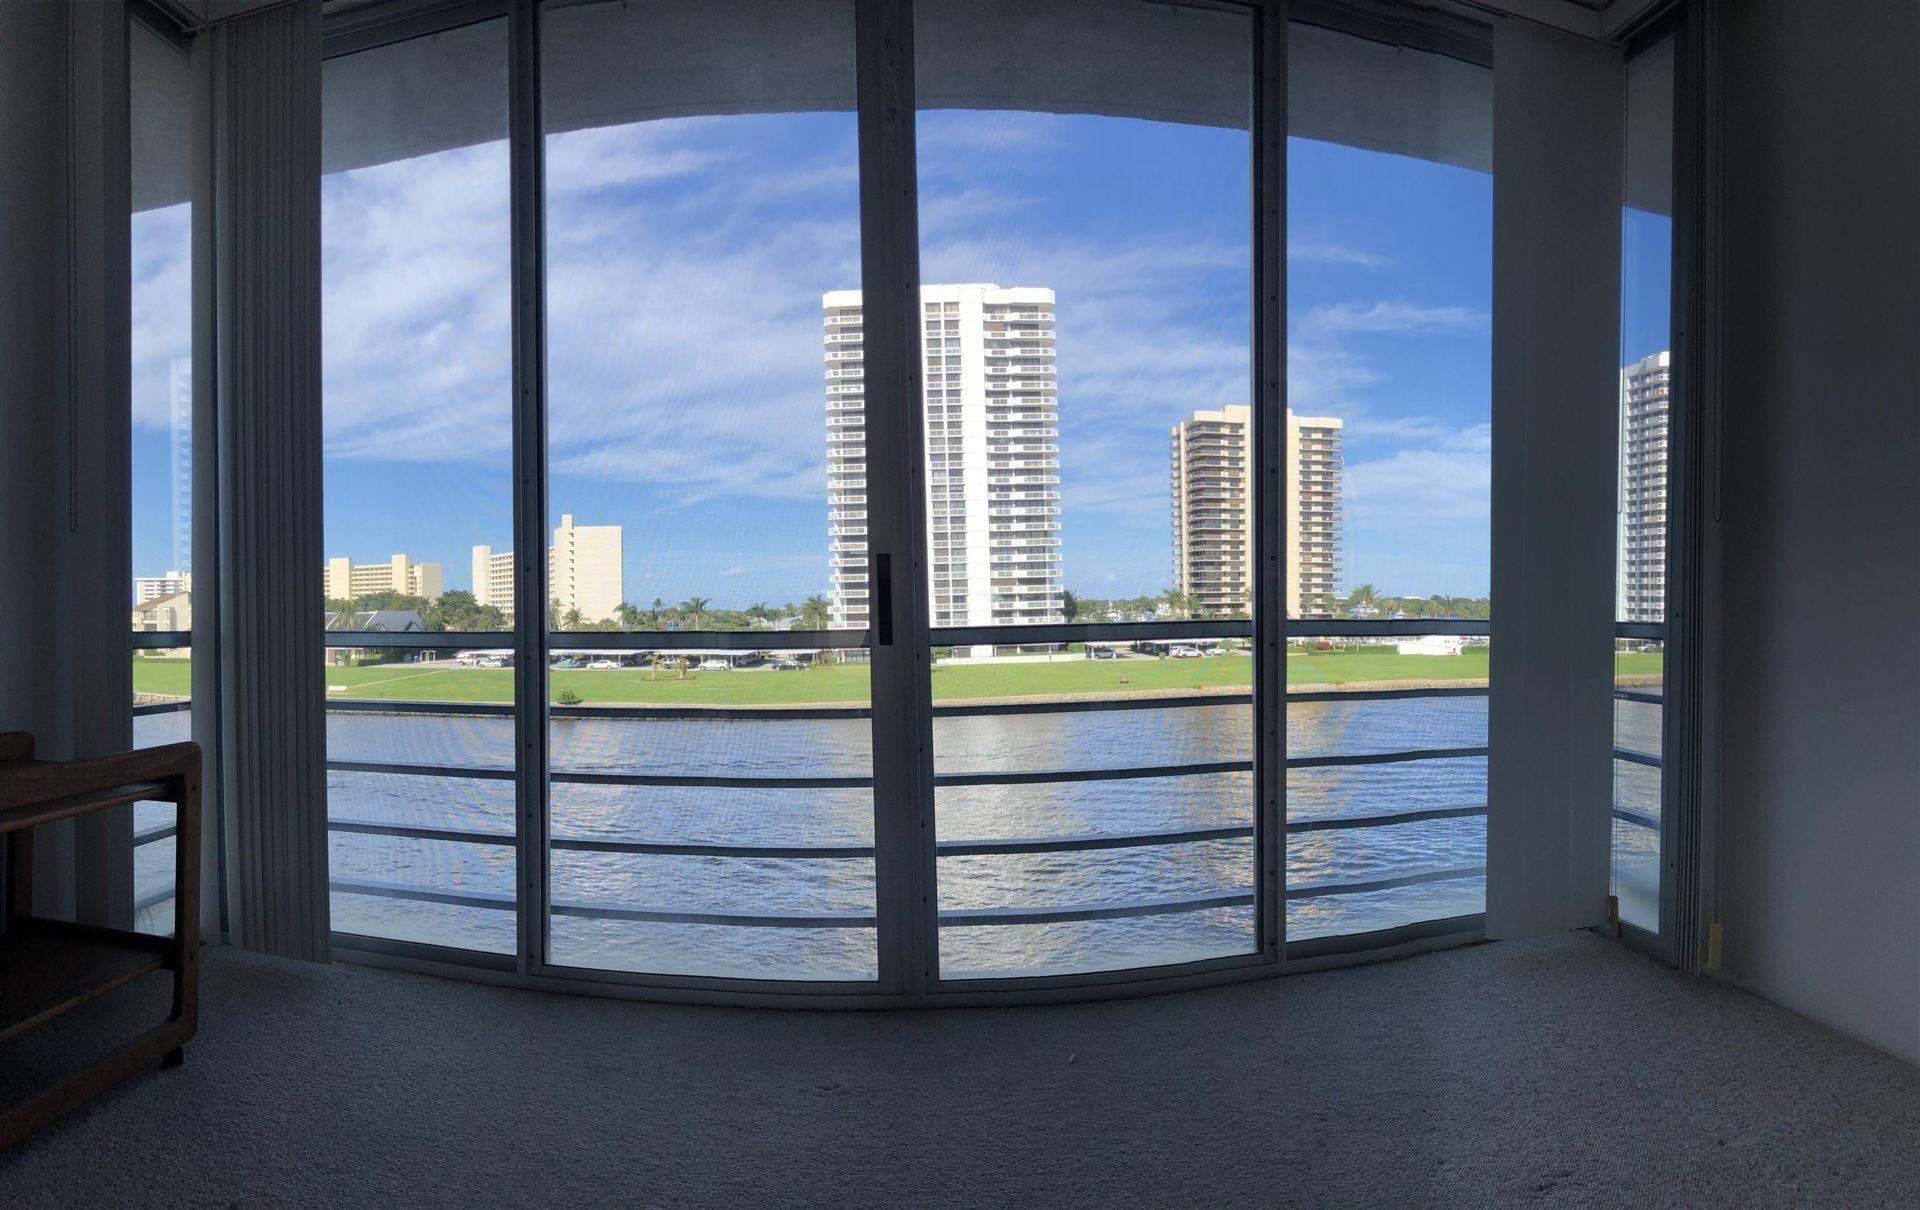 Photo of 28 Yacht Club Drive #402, North Palm Beach, FL 33408 (MLS # RX-10674242)